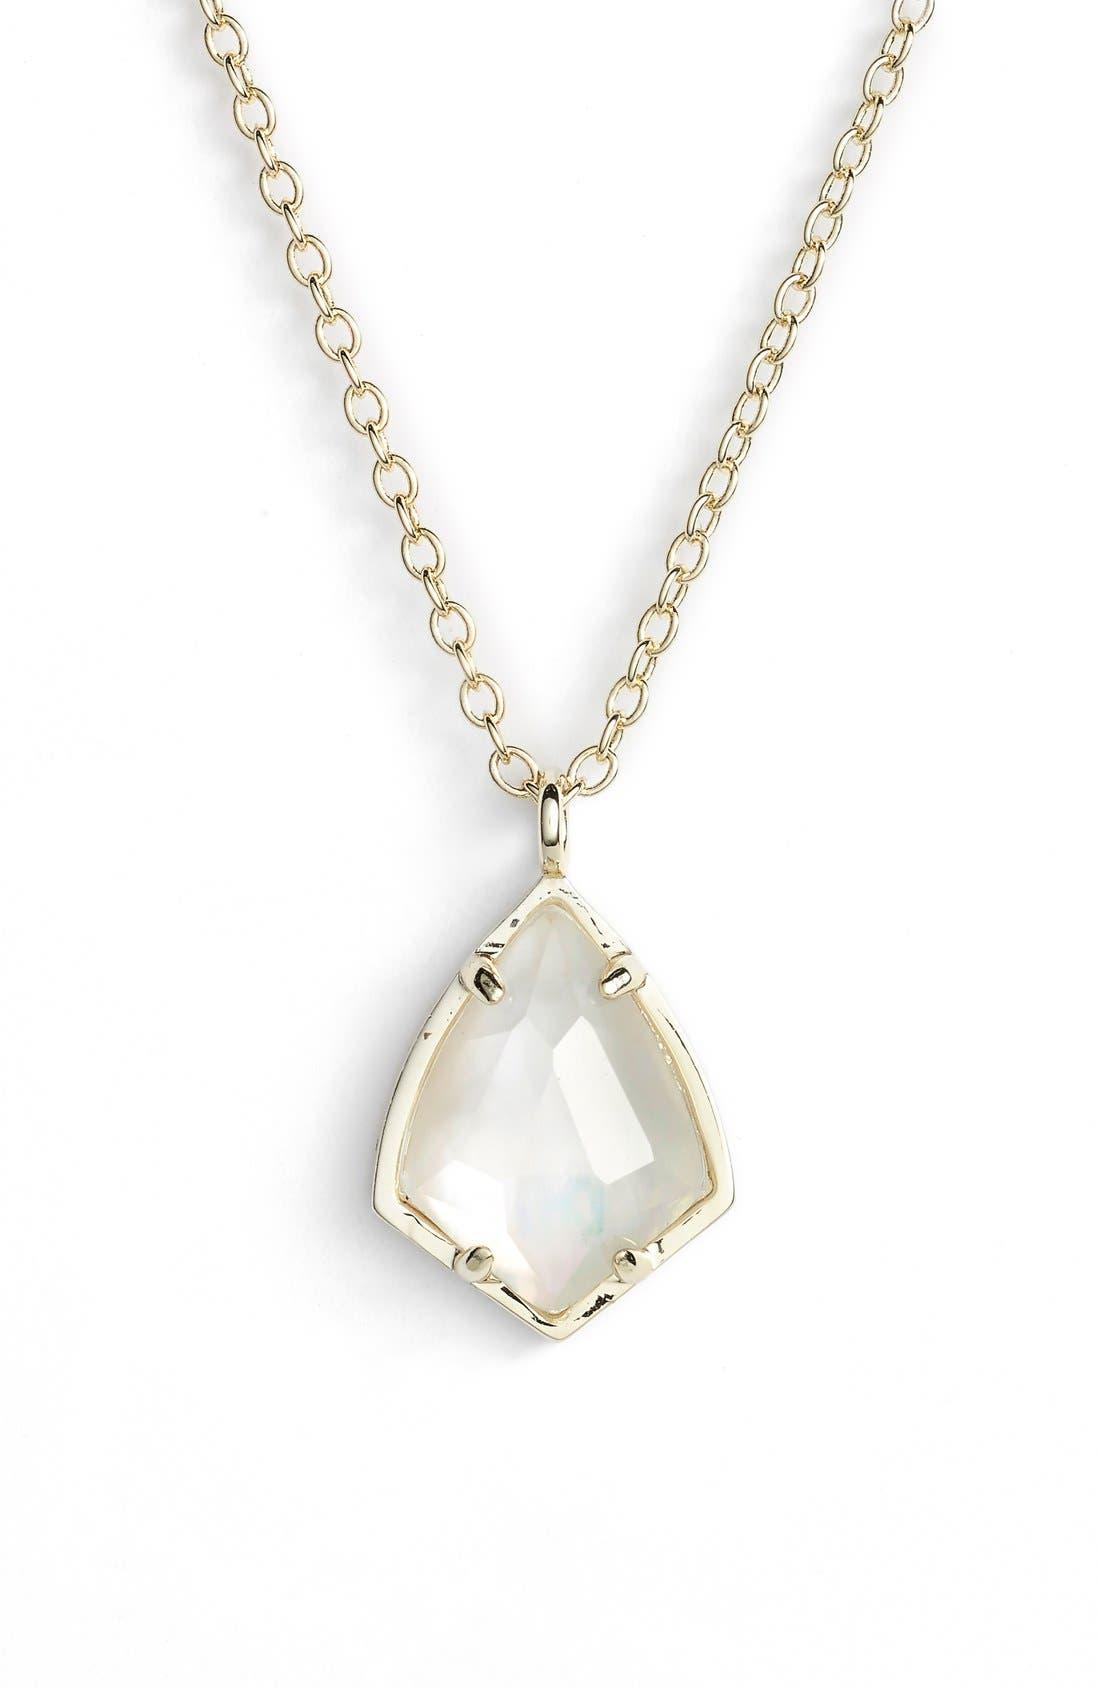 Alternate Image 1 Selected - Kendra Scott 'Cory' Semiprecious Stone Pendant Necklace